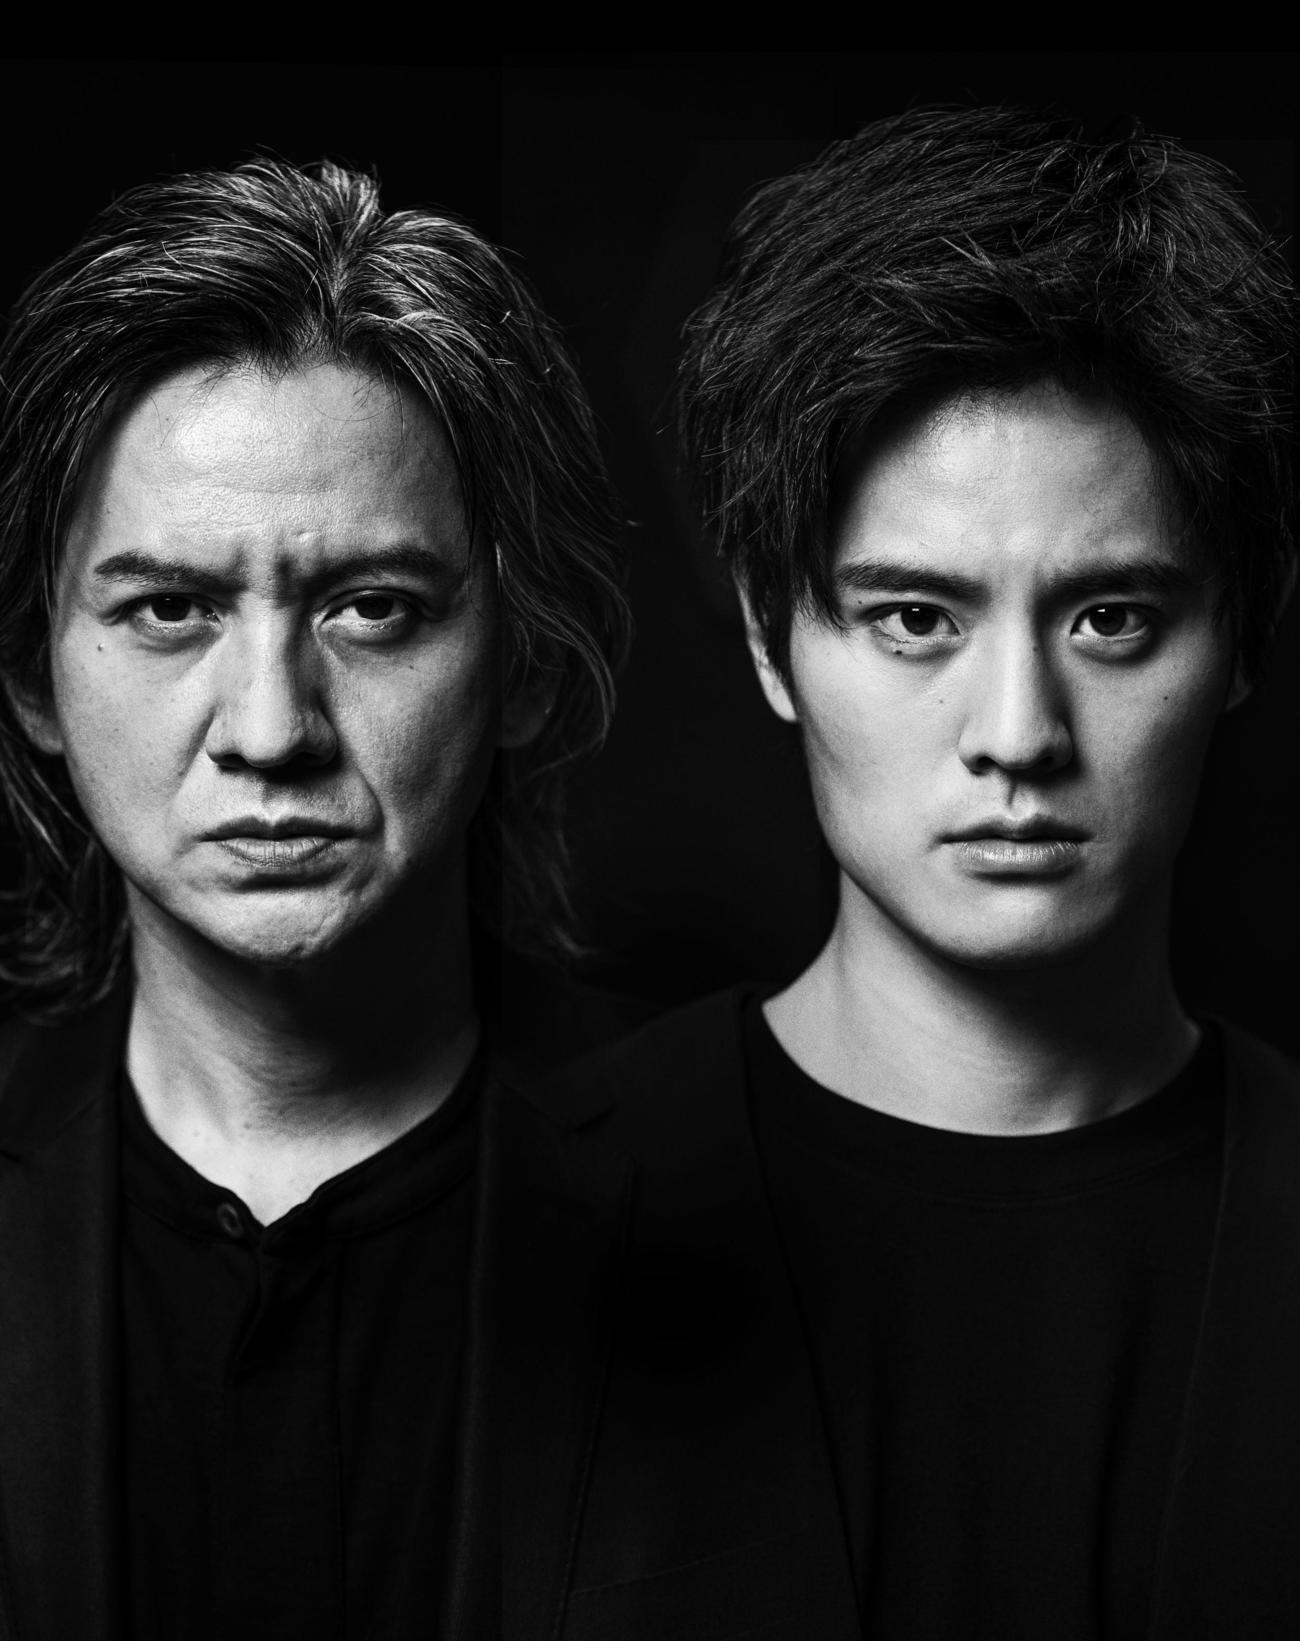 「Le Fils 息子」で舞台初共演する岡本健一、岡本圭人